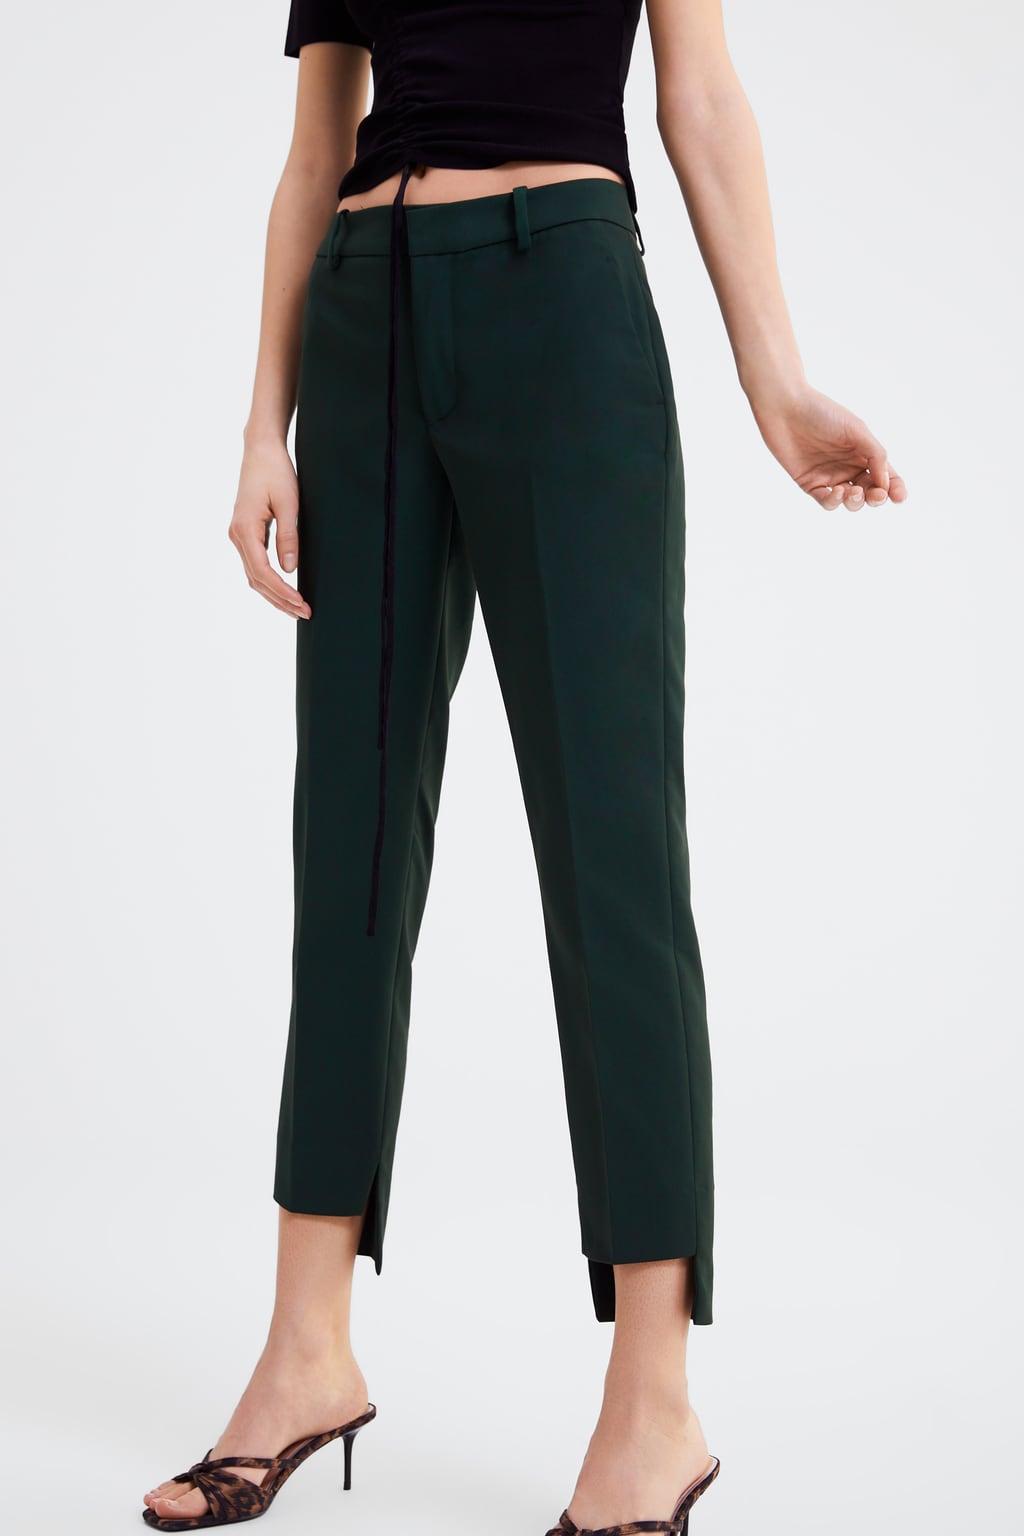 Zara - Straight leg pants with asymmetric hem